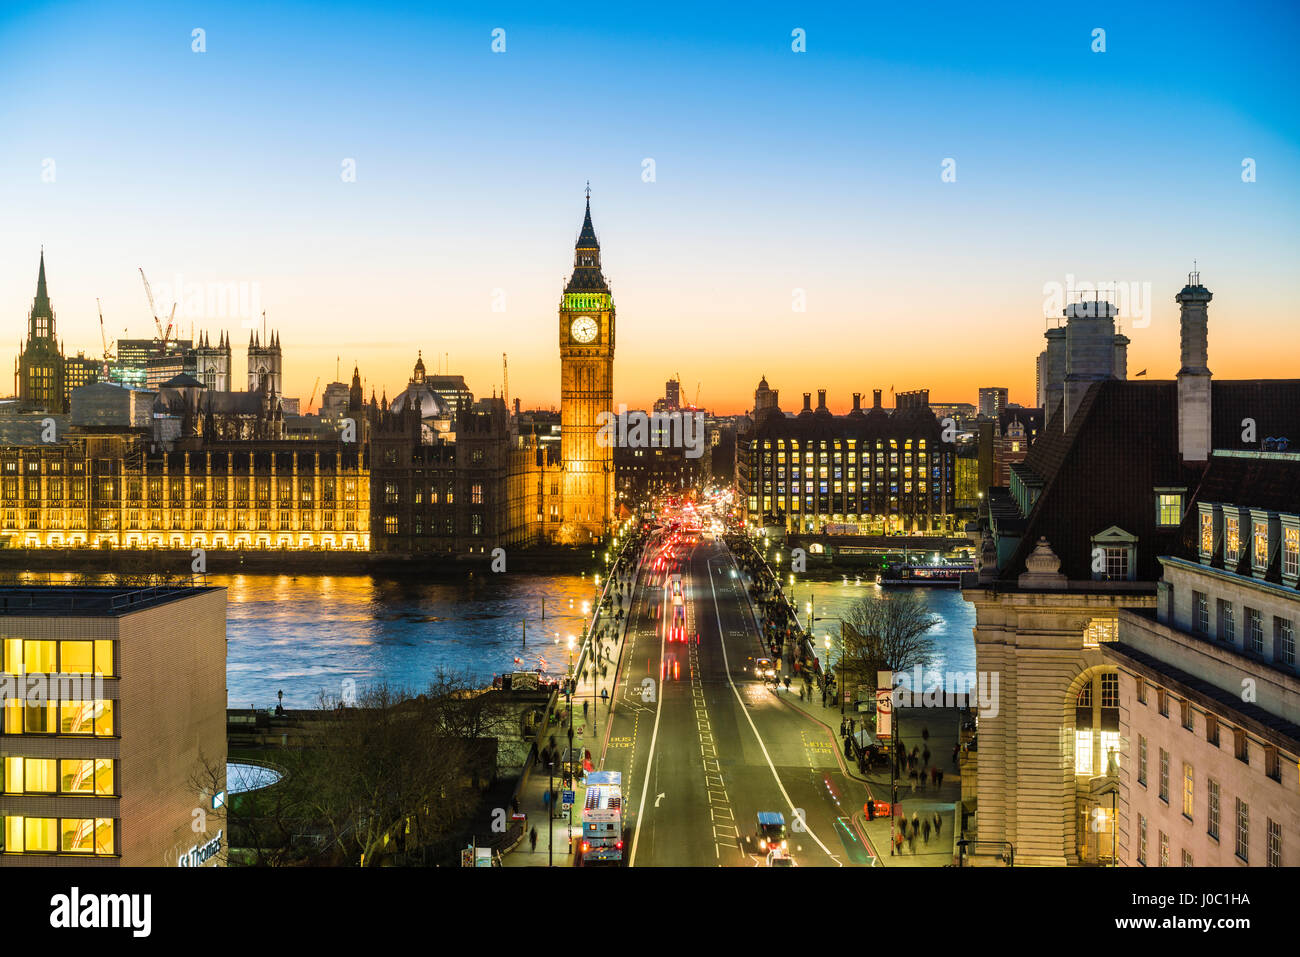 High angle view of Big Ben, le Palais de Westminster et Westminster Bridge at Dusk, London, England, UK Photo Stock